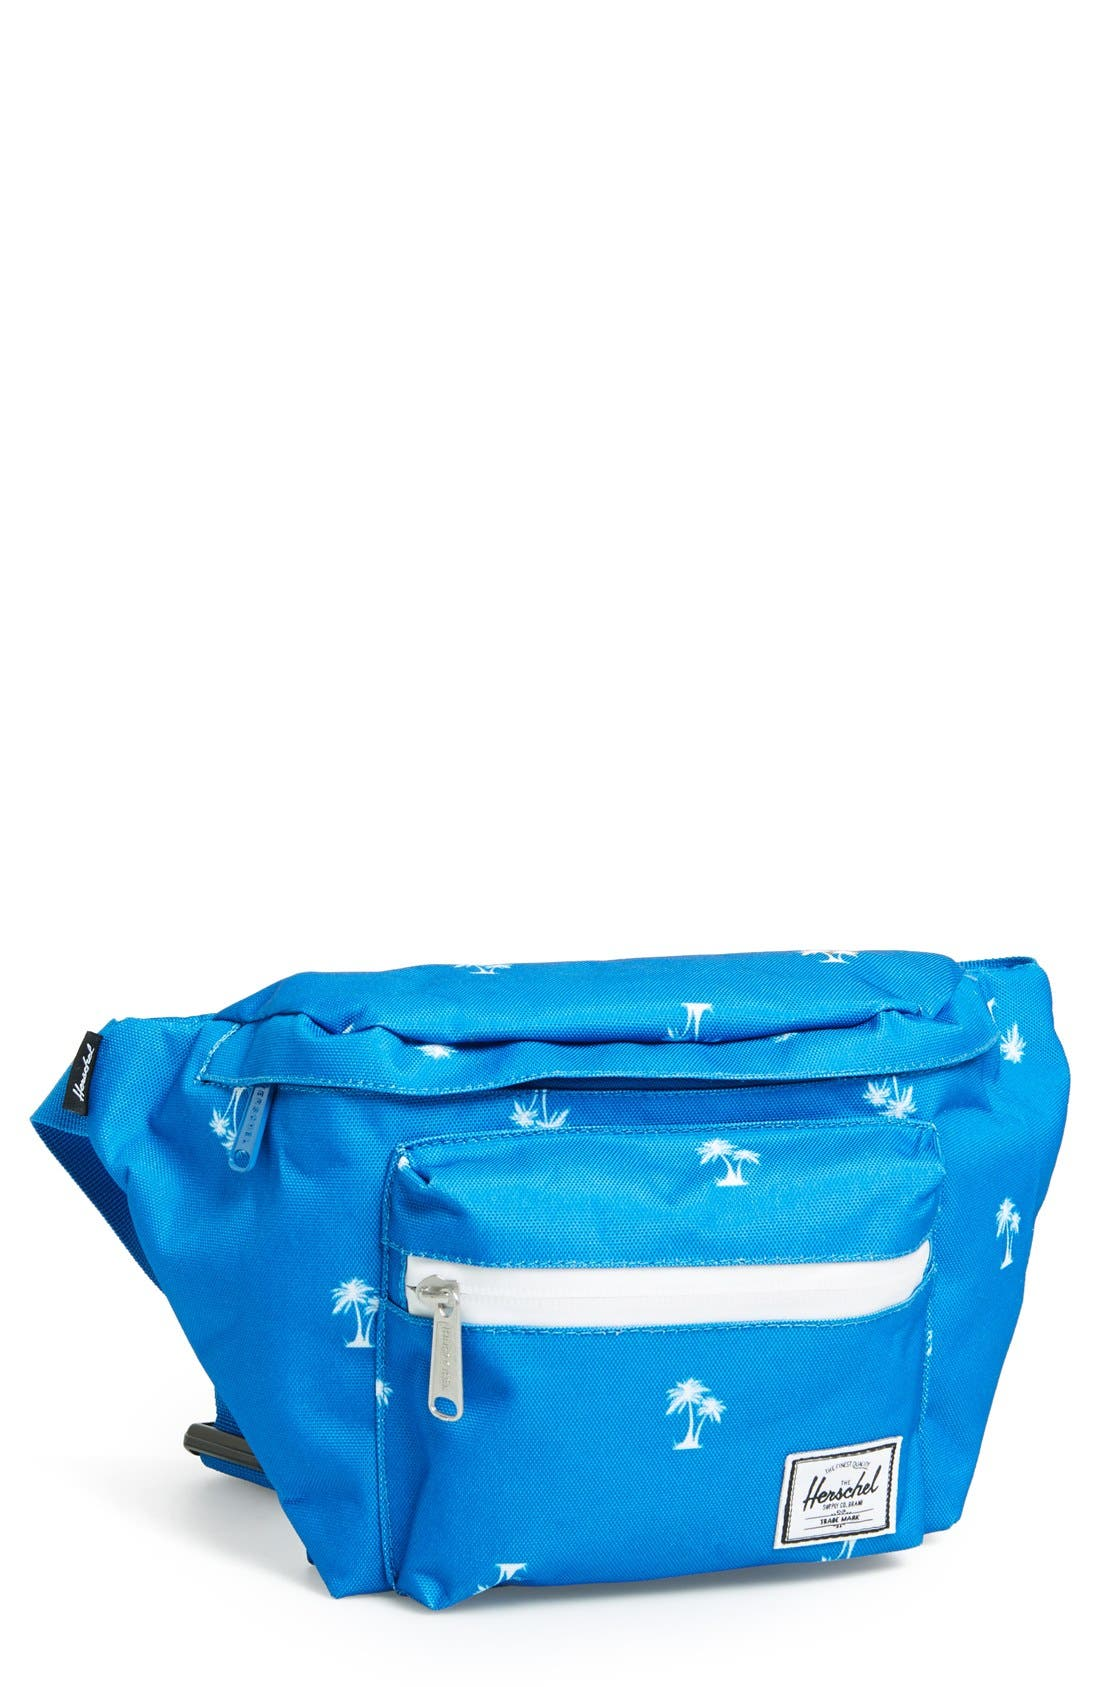 Alternate Image 1 Selected - Herschel Supply Co. 'Seventeen' Belt Bag